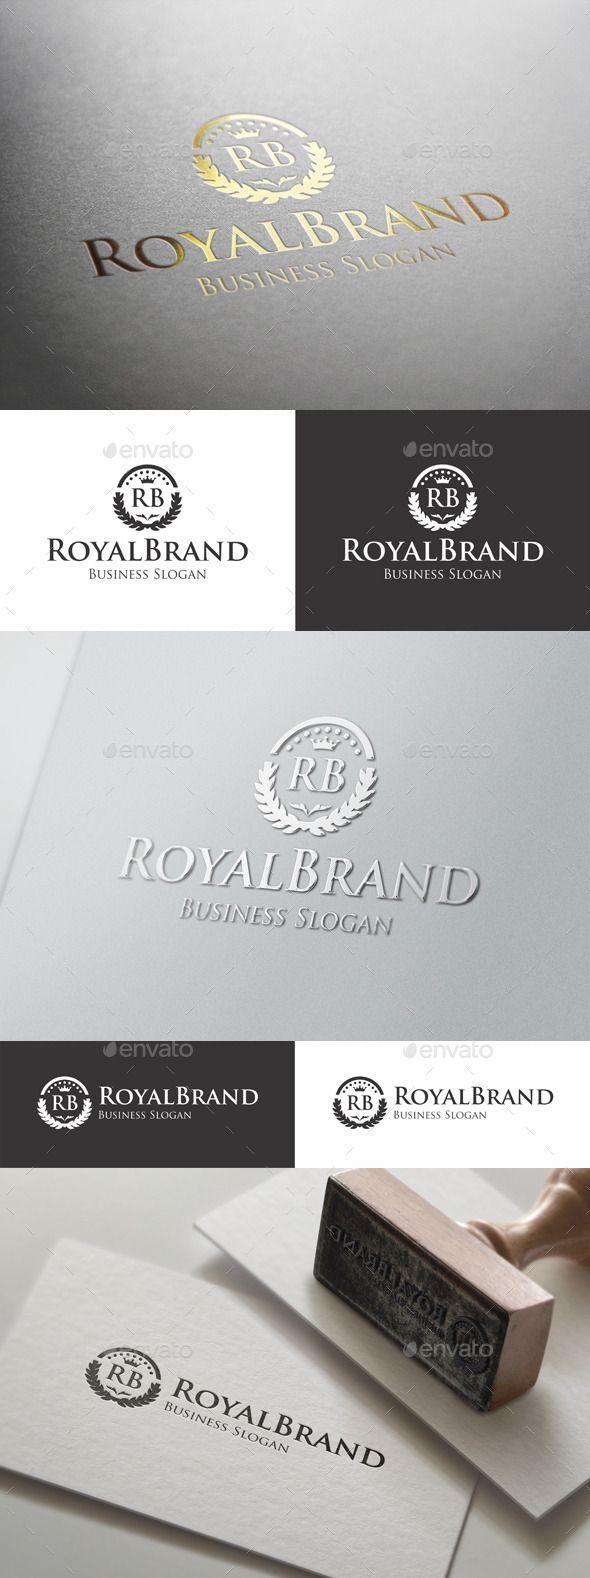 Royal Brand Fashion Boutique Logo — Vector EPS #restaurant #Premium Fashion Logo • Available here → https://graphicriver.net/item/royal-brand-fashion-boutique-logo/9875883?ref=pxcr